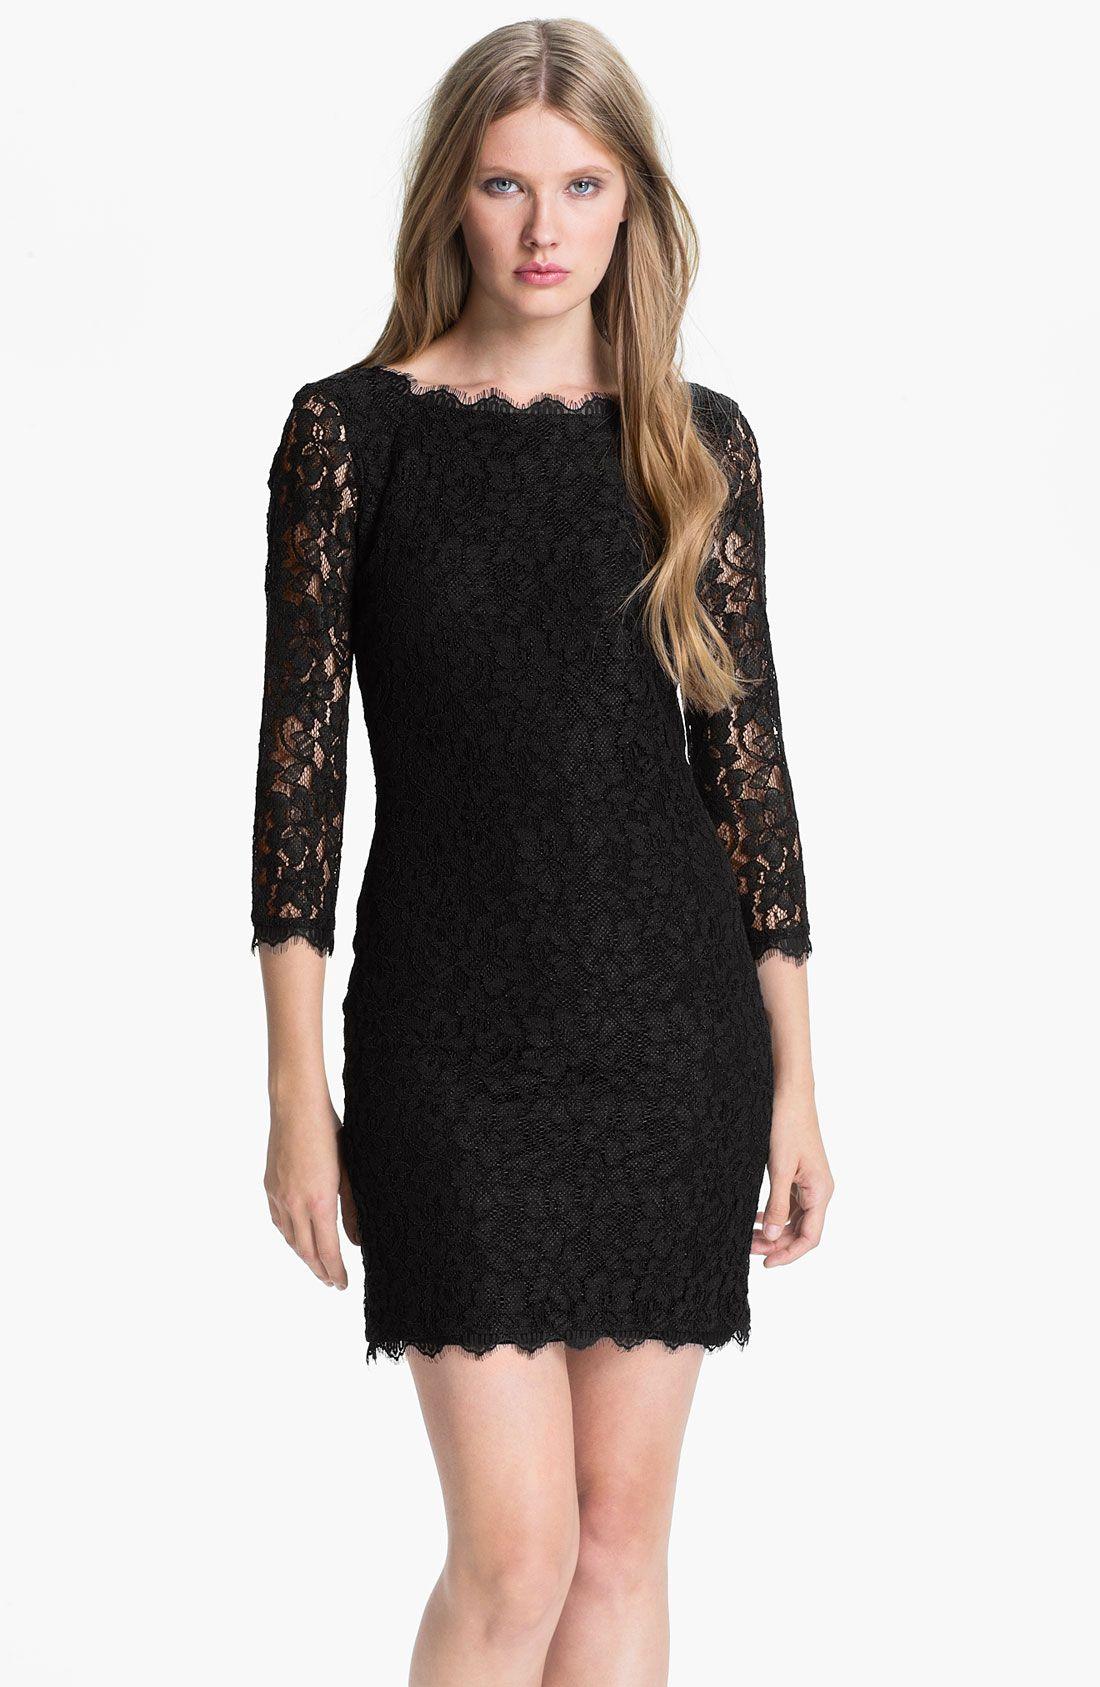 Black Holiday Dress Photo Album - Reikian